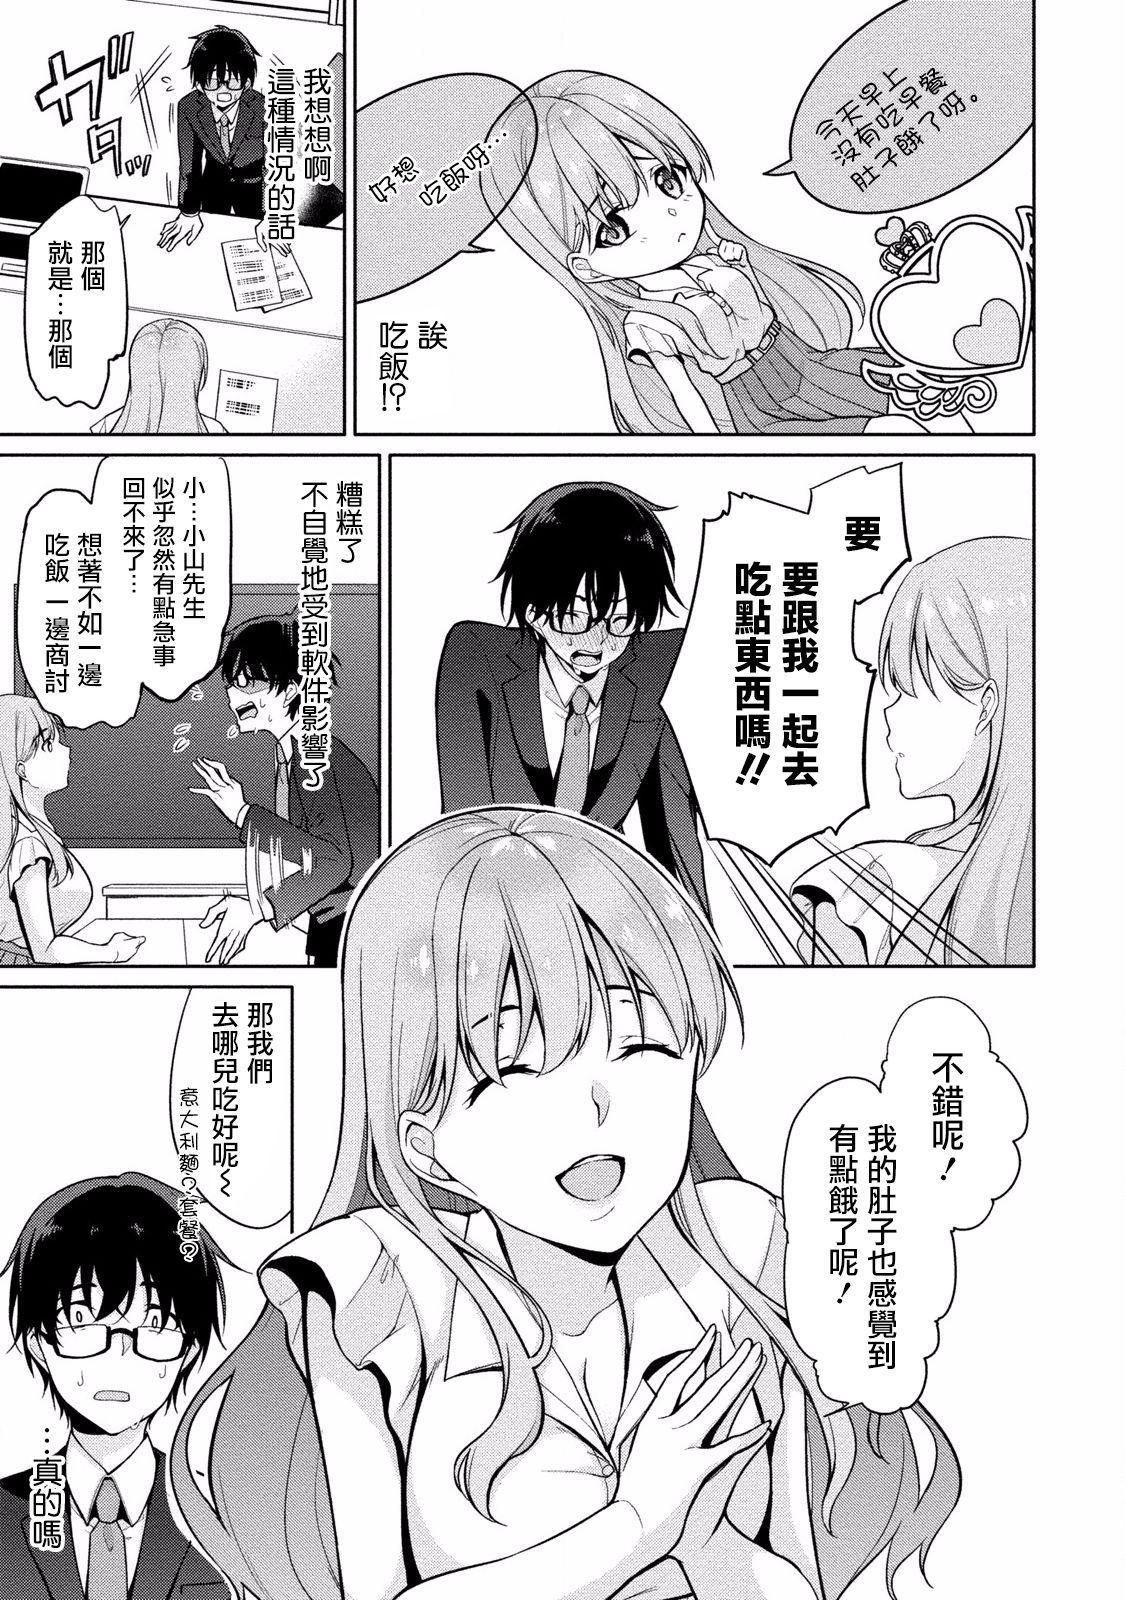 [Yukino] Satou-kun wa Miteiru. ~Kami-sama Appli de Onnanoko no Kokoro o Nozoitara Do XX datta~ Ch. 2 | 佐藤君正在偷窥。~用神大人的APP偷窥女孩子的内心却发现原来是抖XX~02话 [Chinese] [前线作♂战♀基地] 10